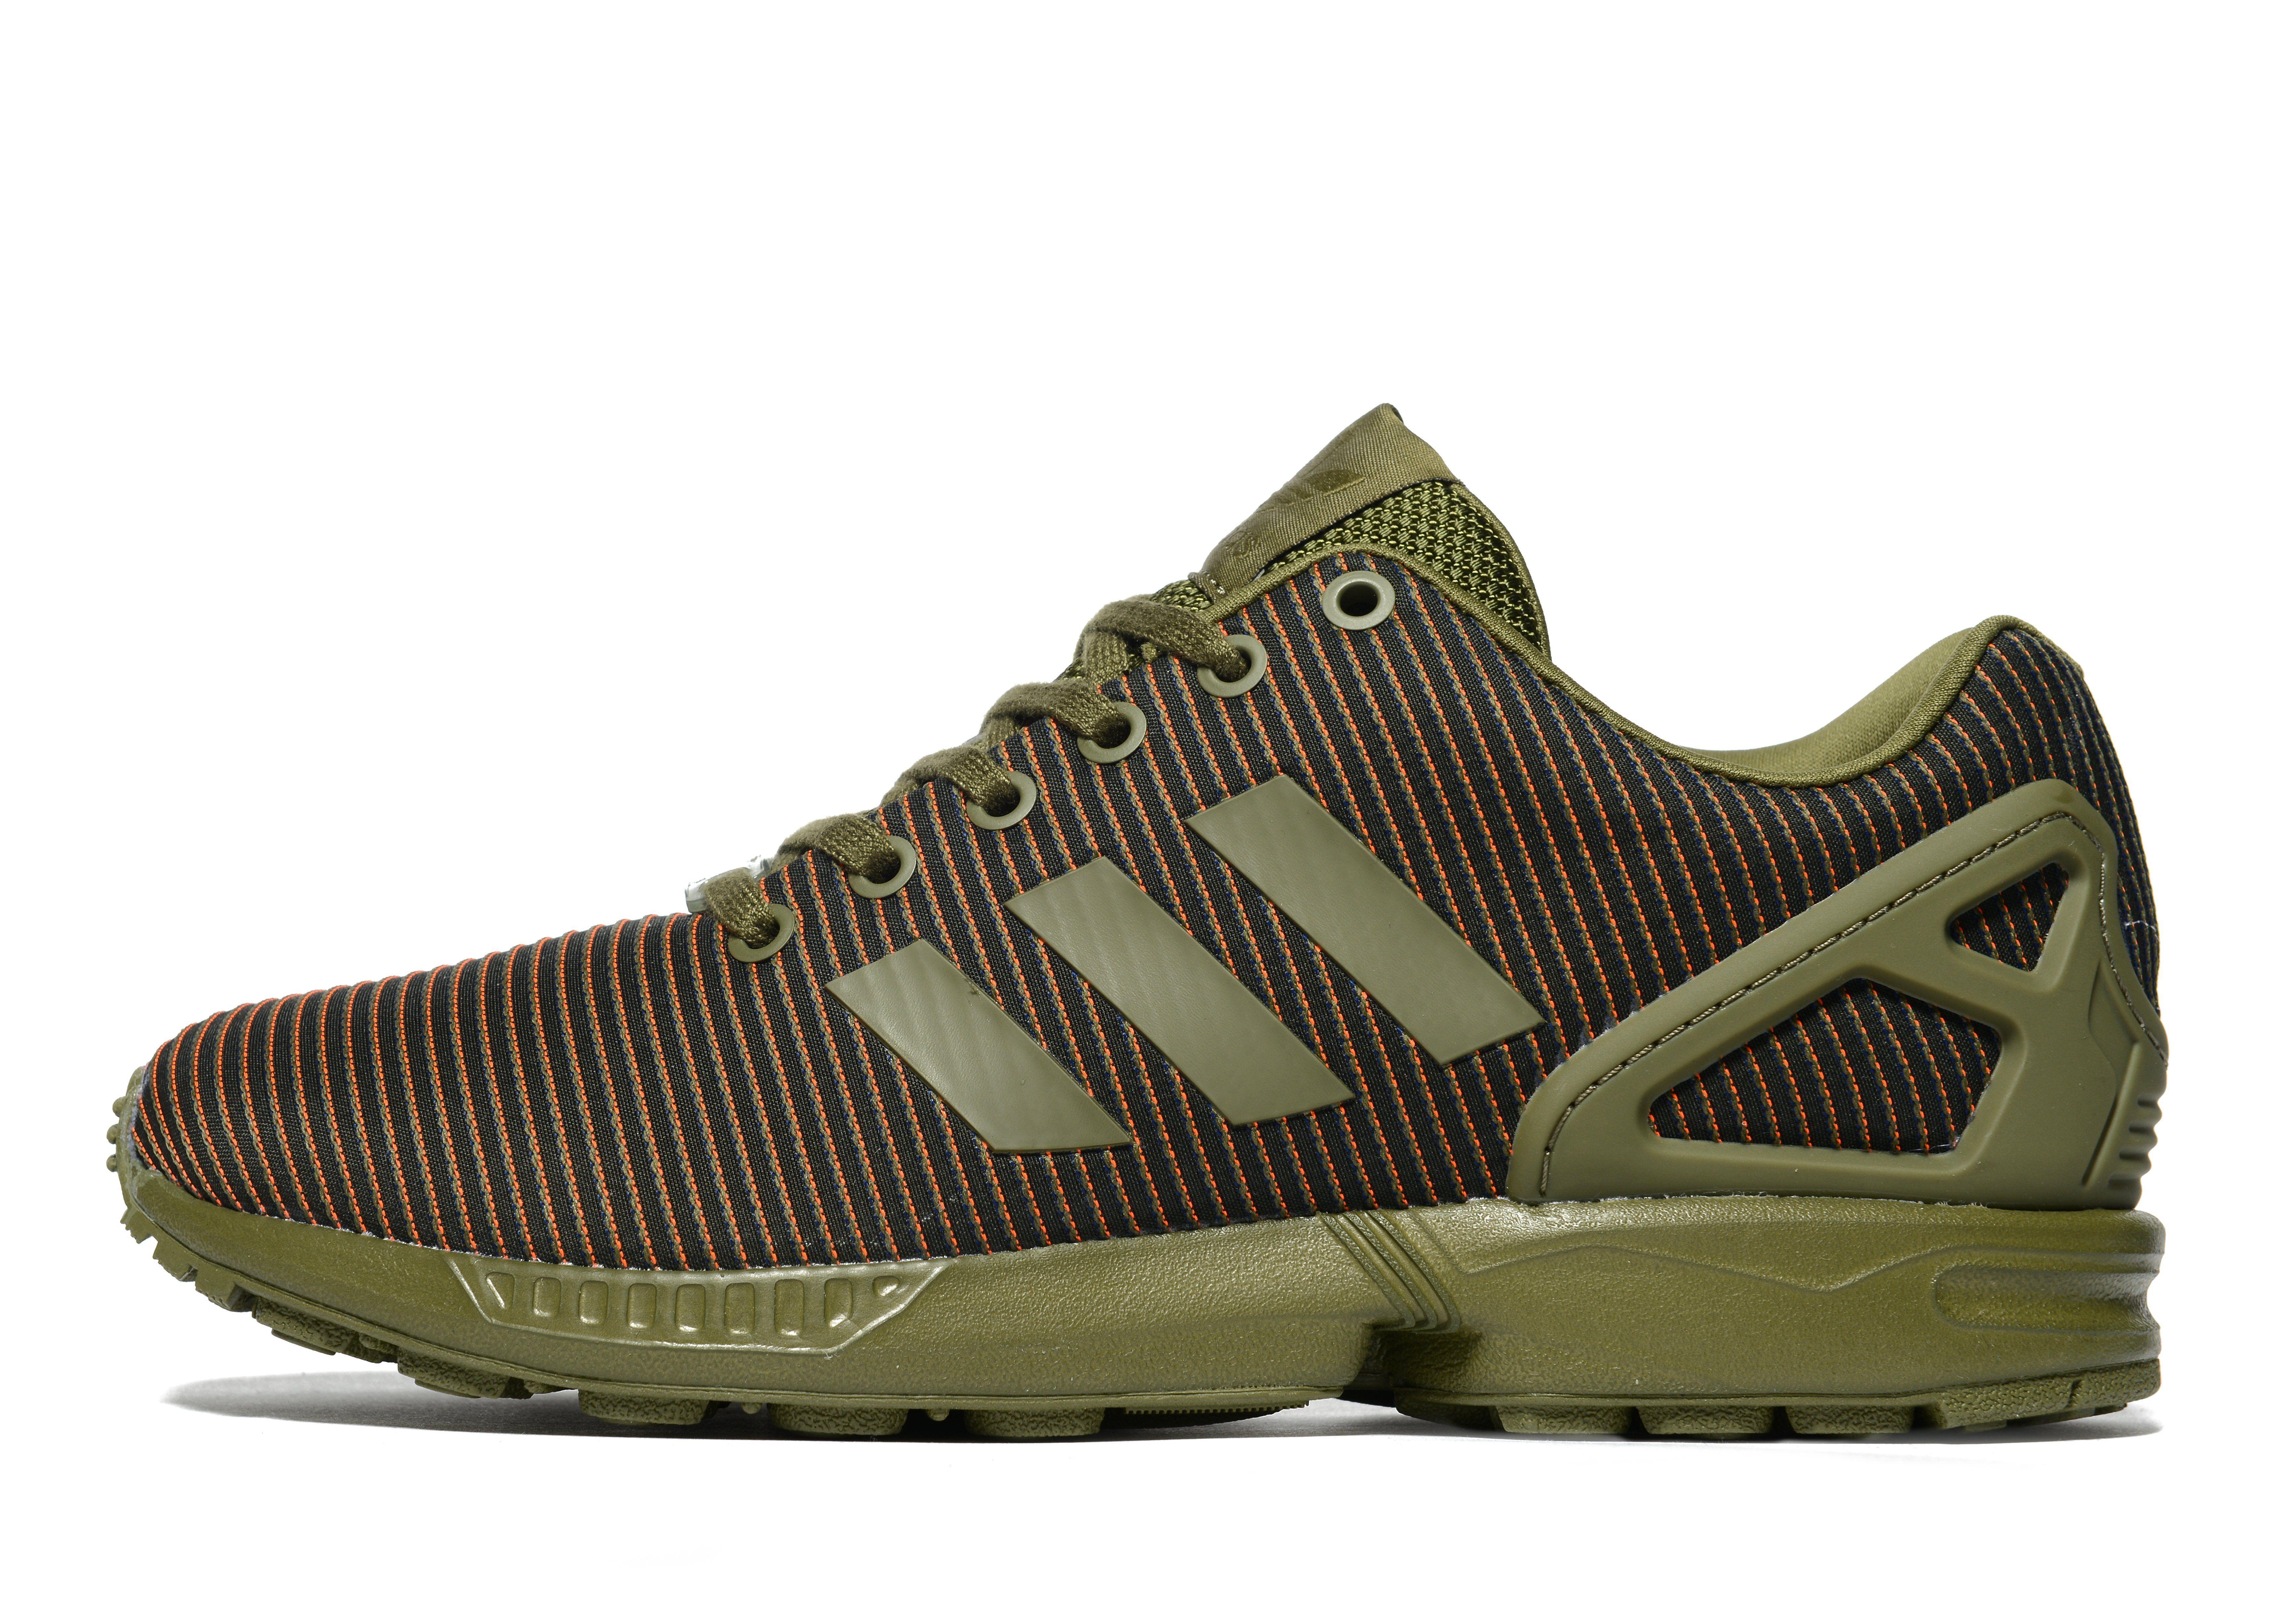 Adidas Zx Series